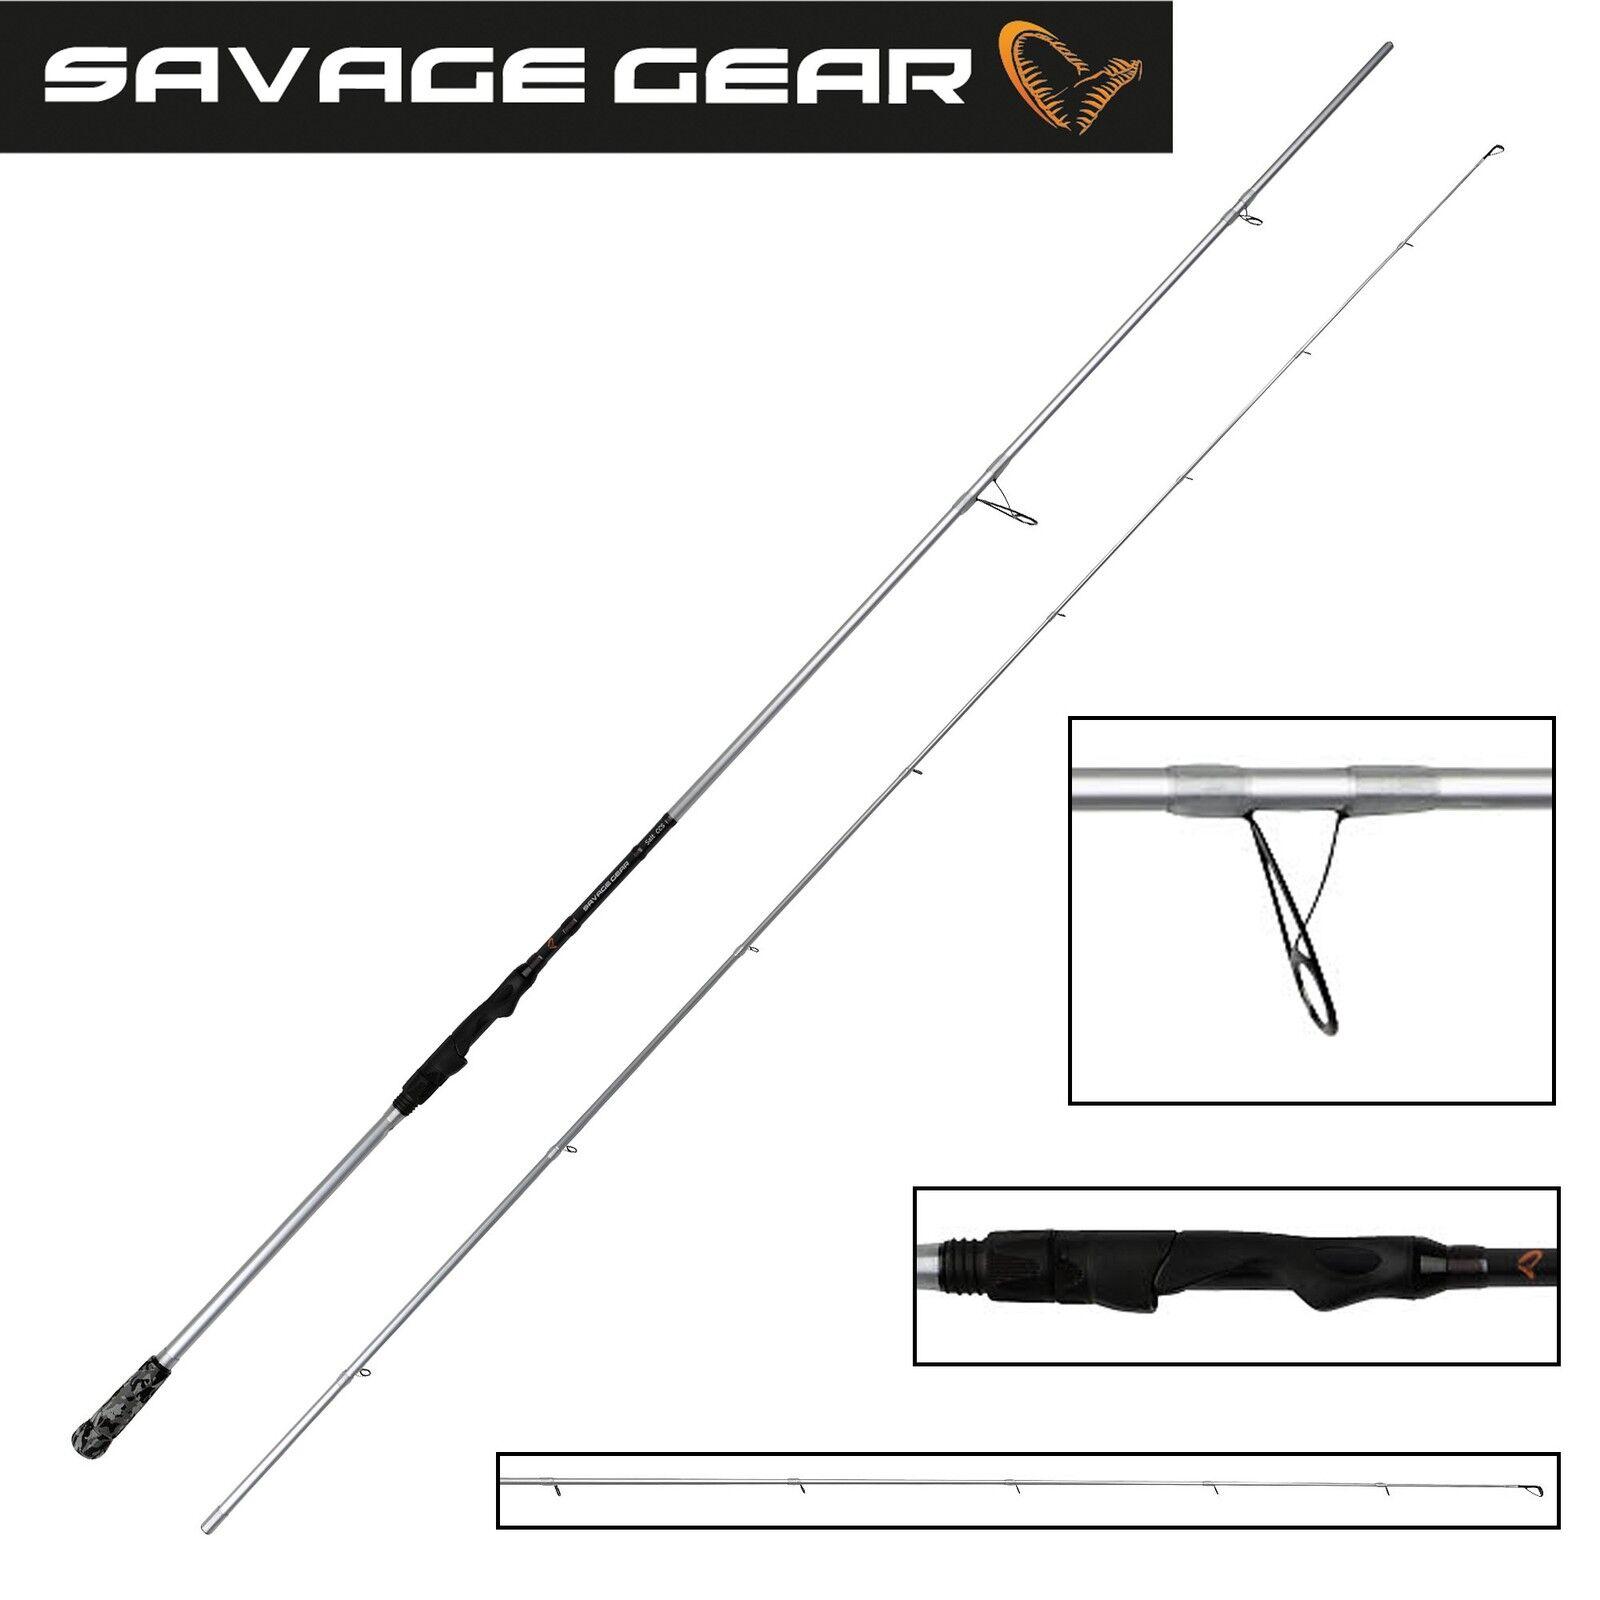 Savage Gear Salt CCS Spinnrute, 8'6